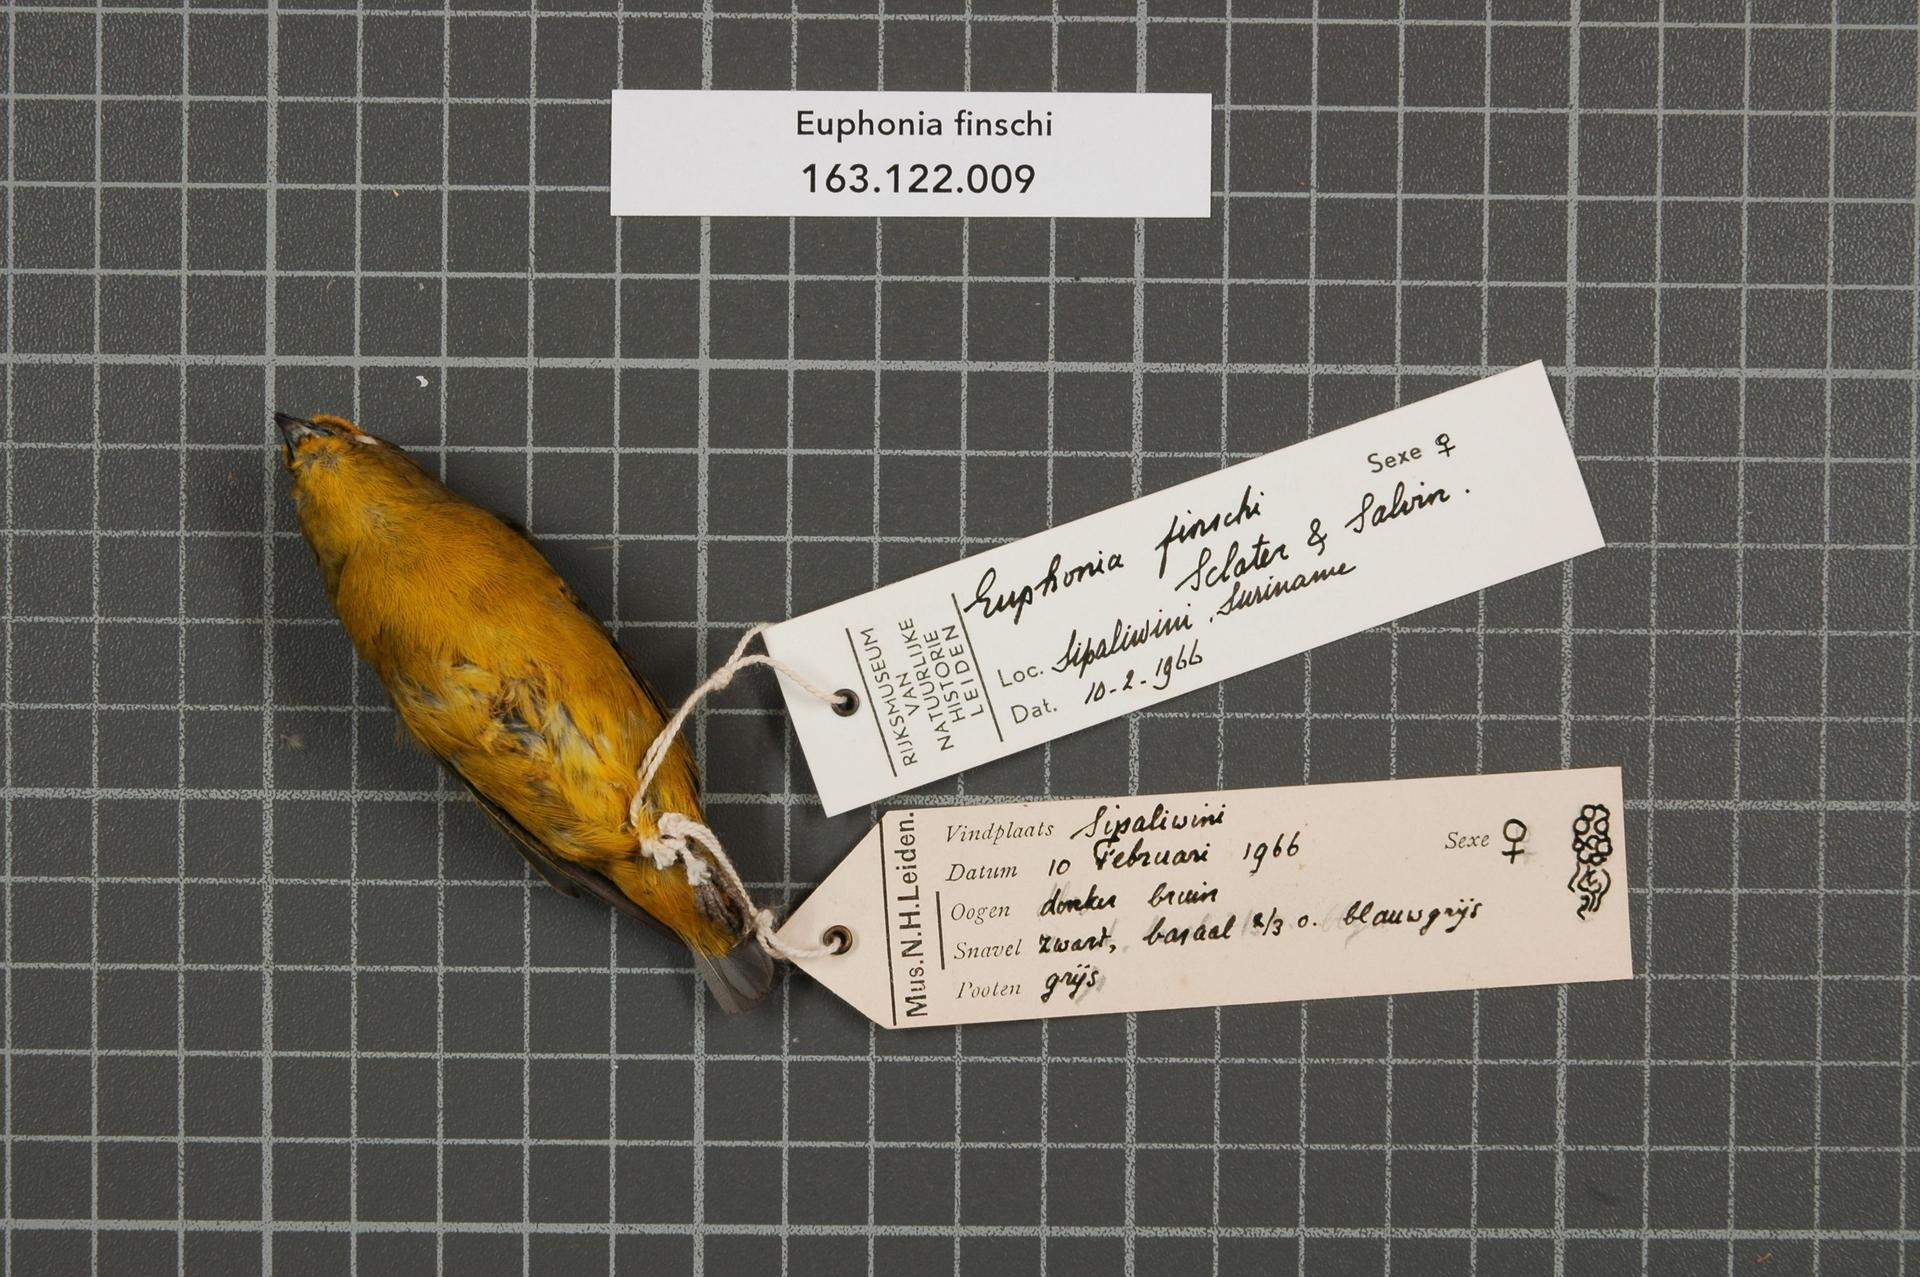 Image of Finsch's Euphonia